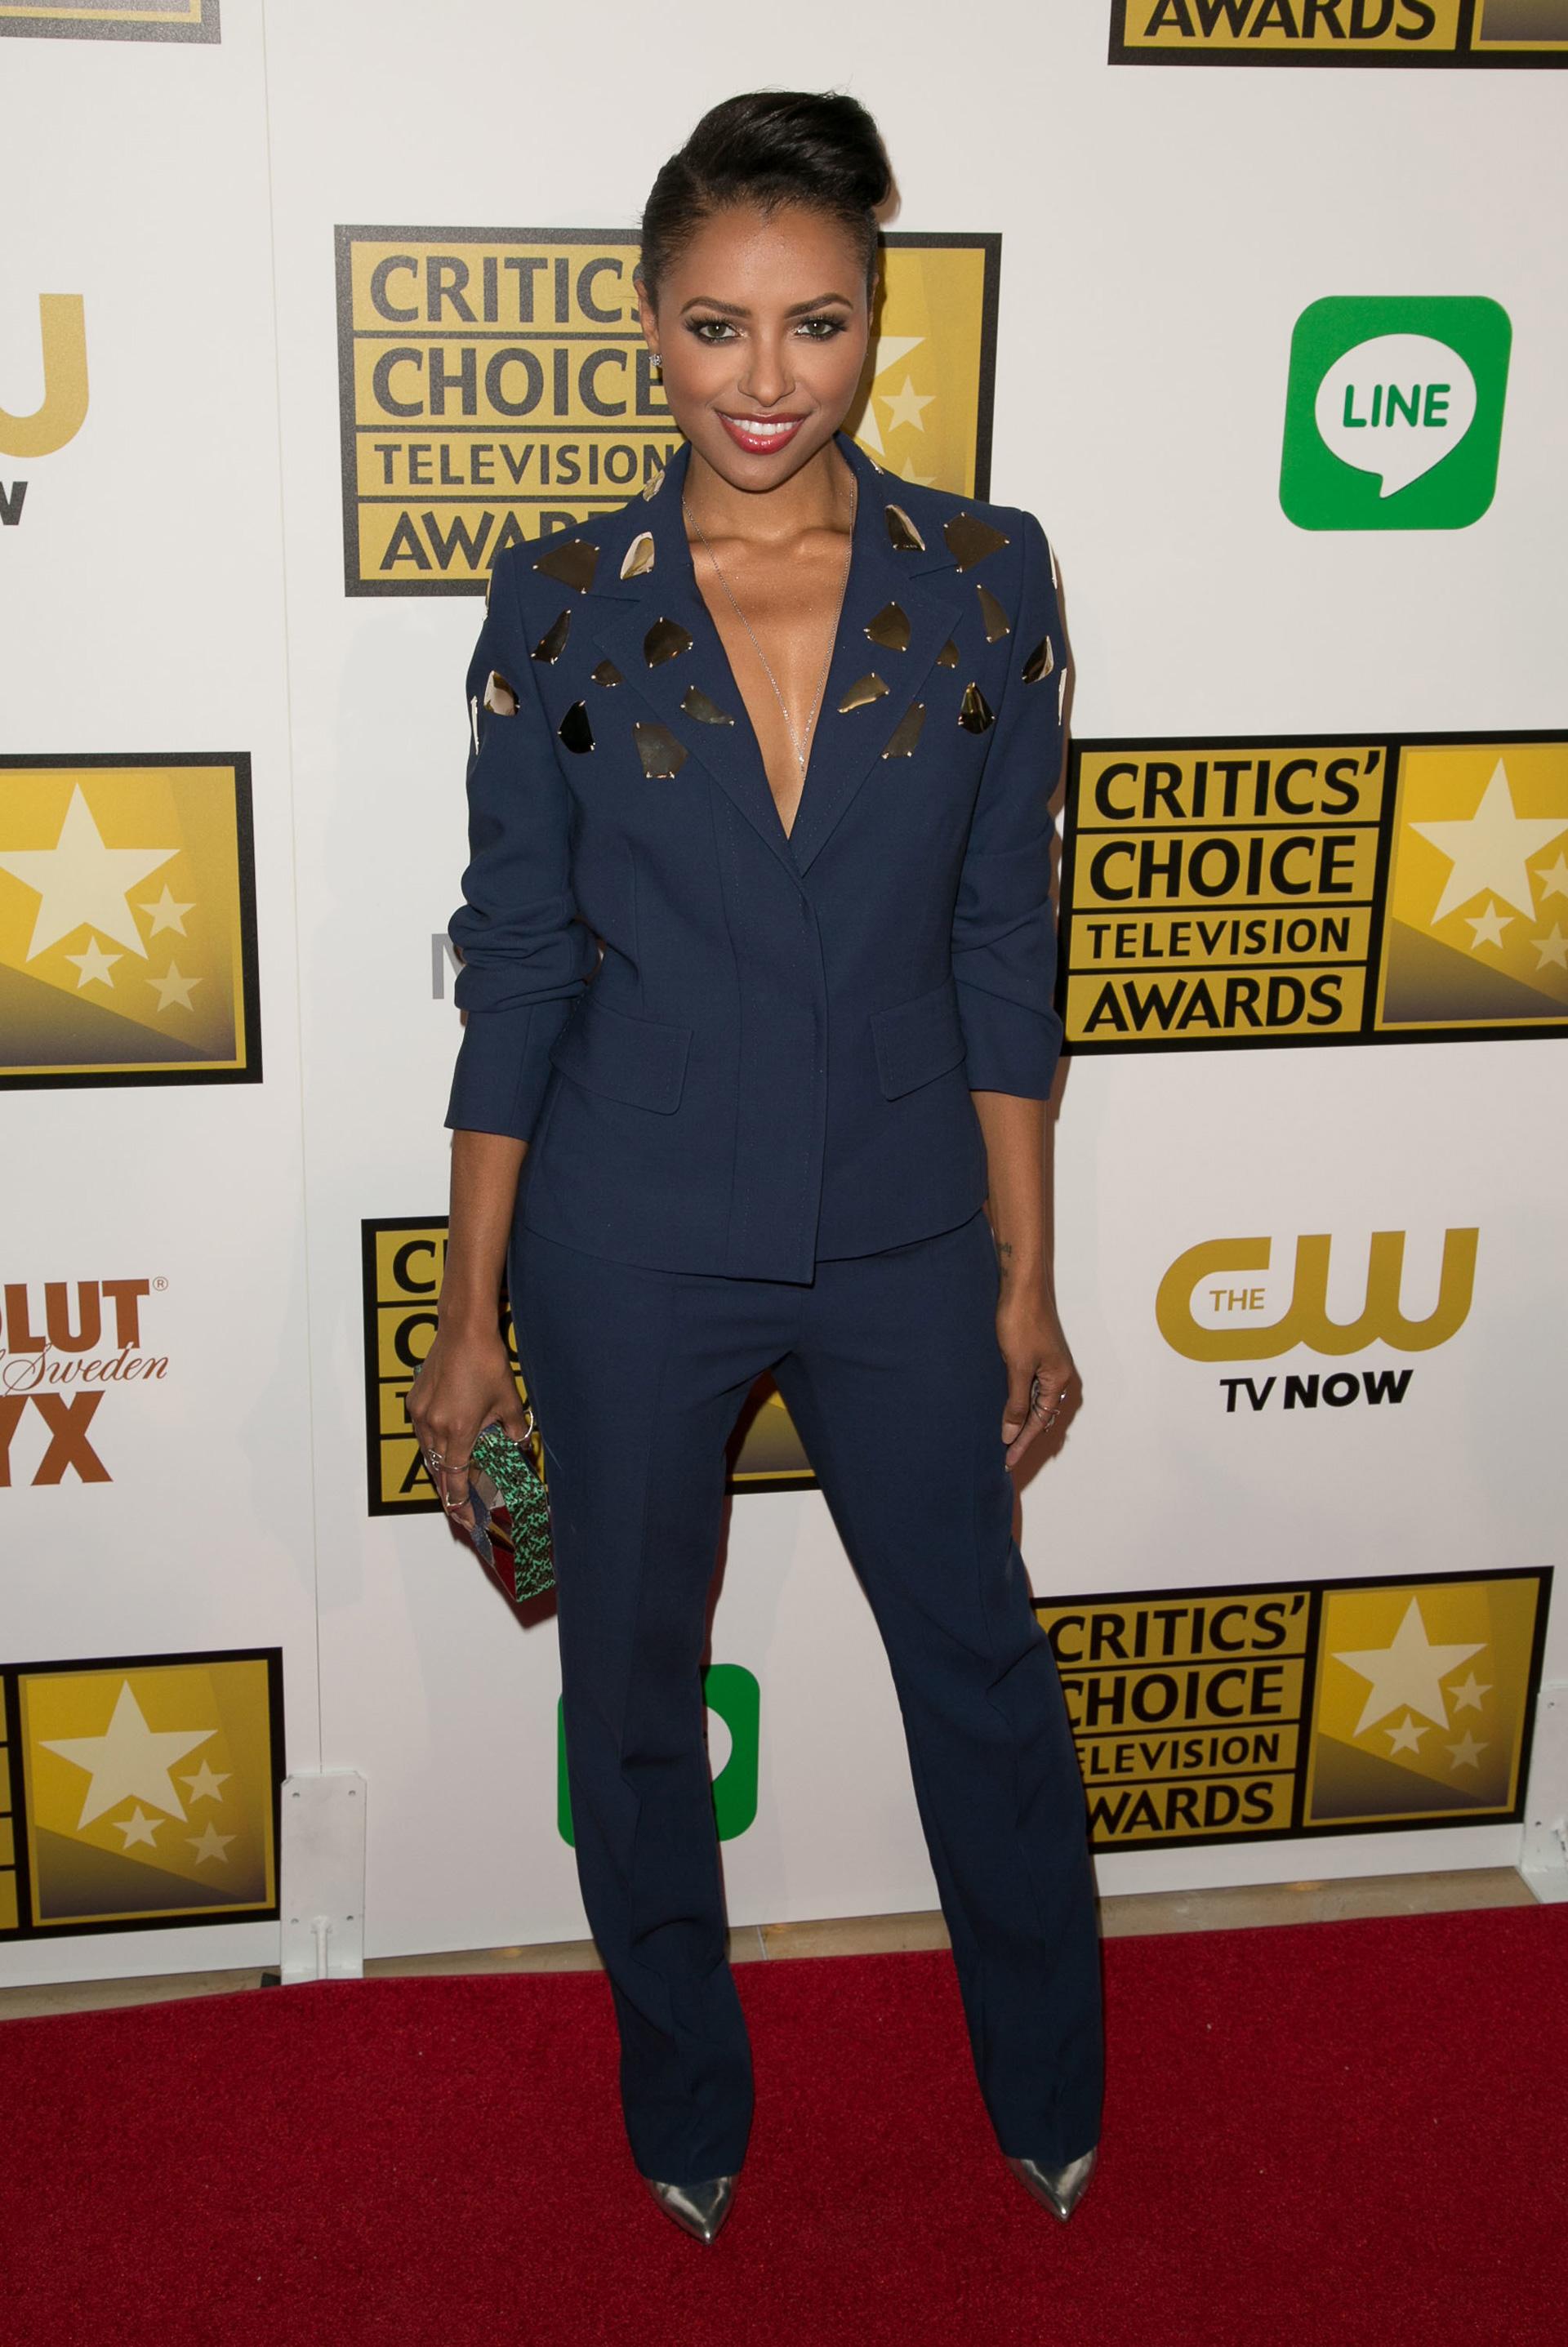 Kat Graham at the Critic's Choice Awards